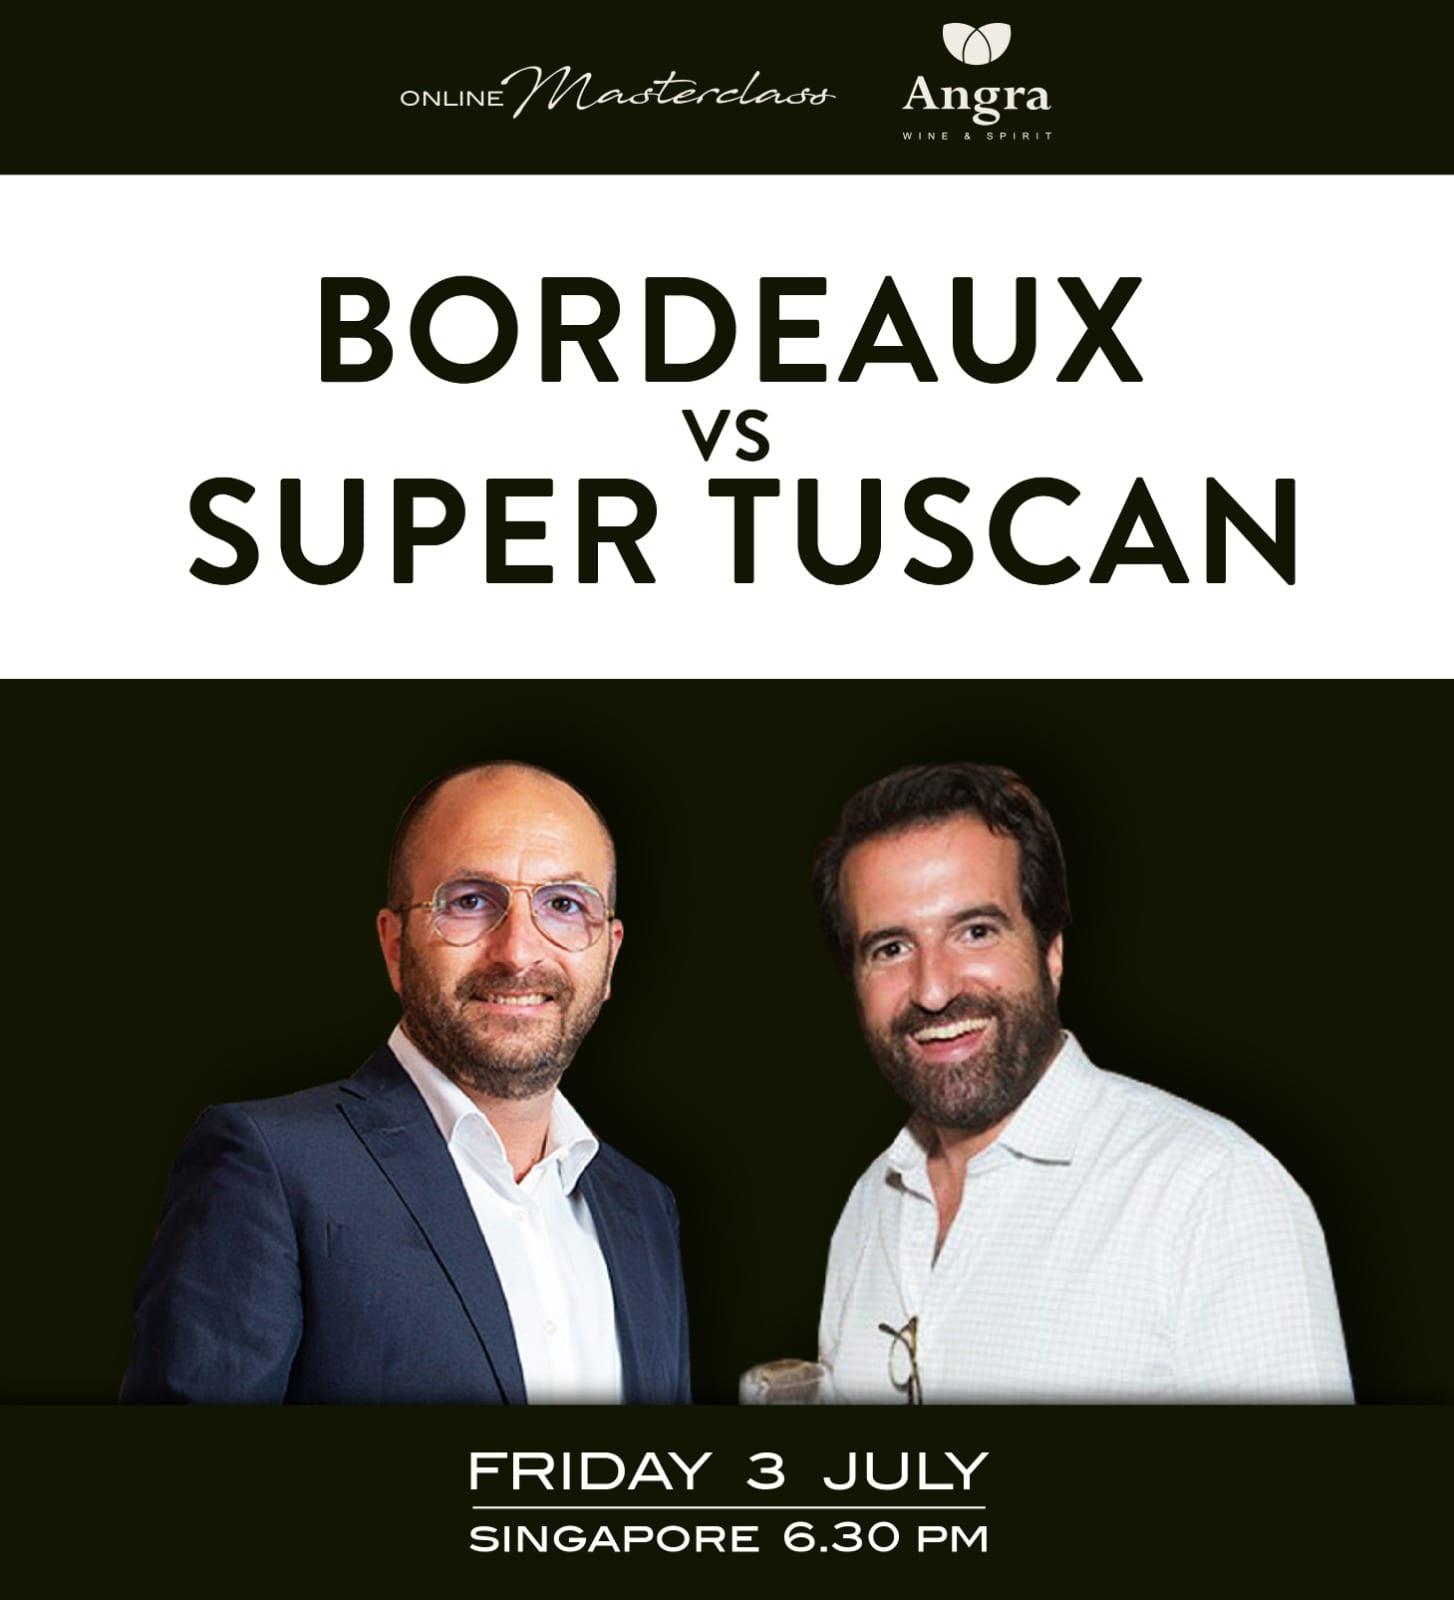 Free Wine Masterclass: BORDEAUX vs SUPER TUSCAN